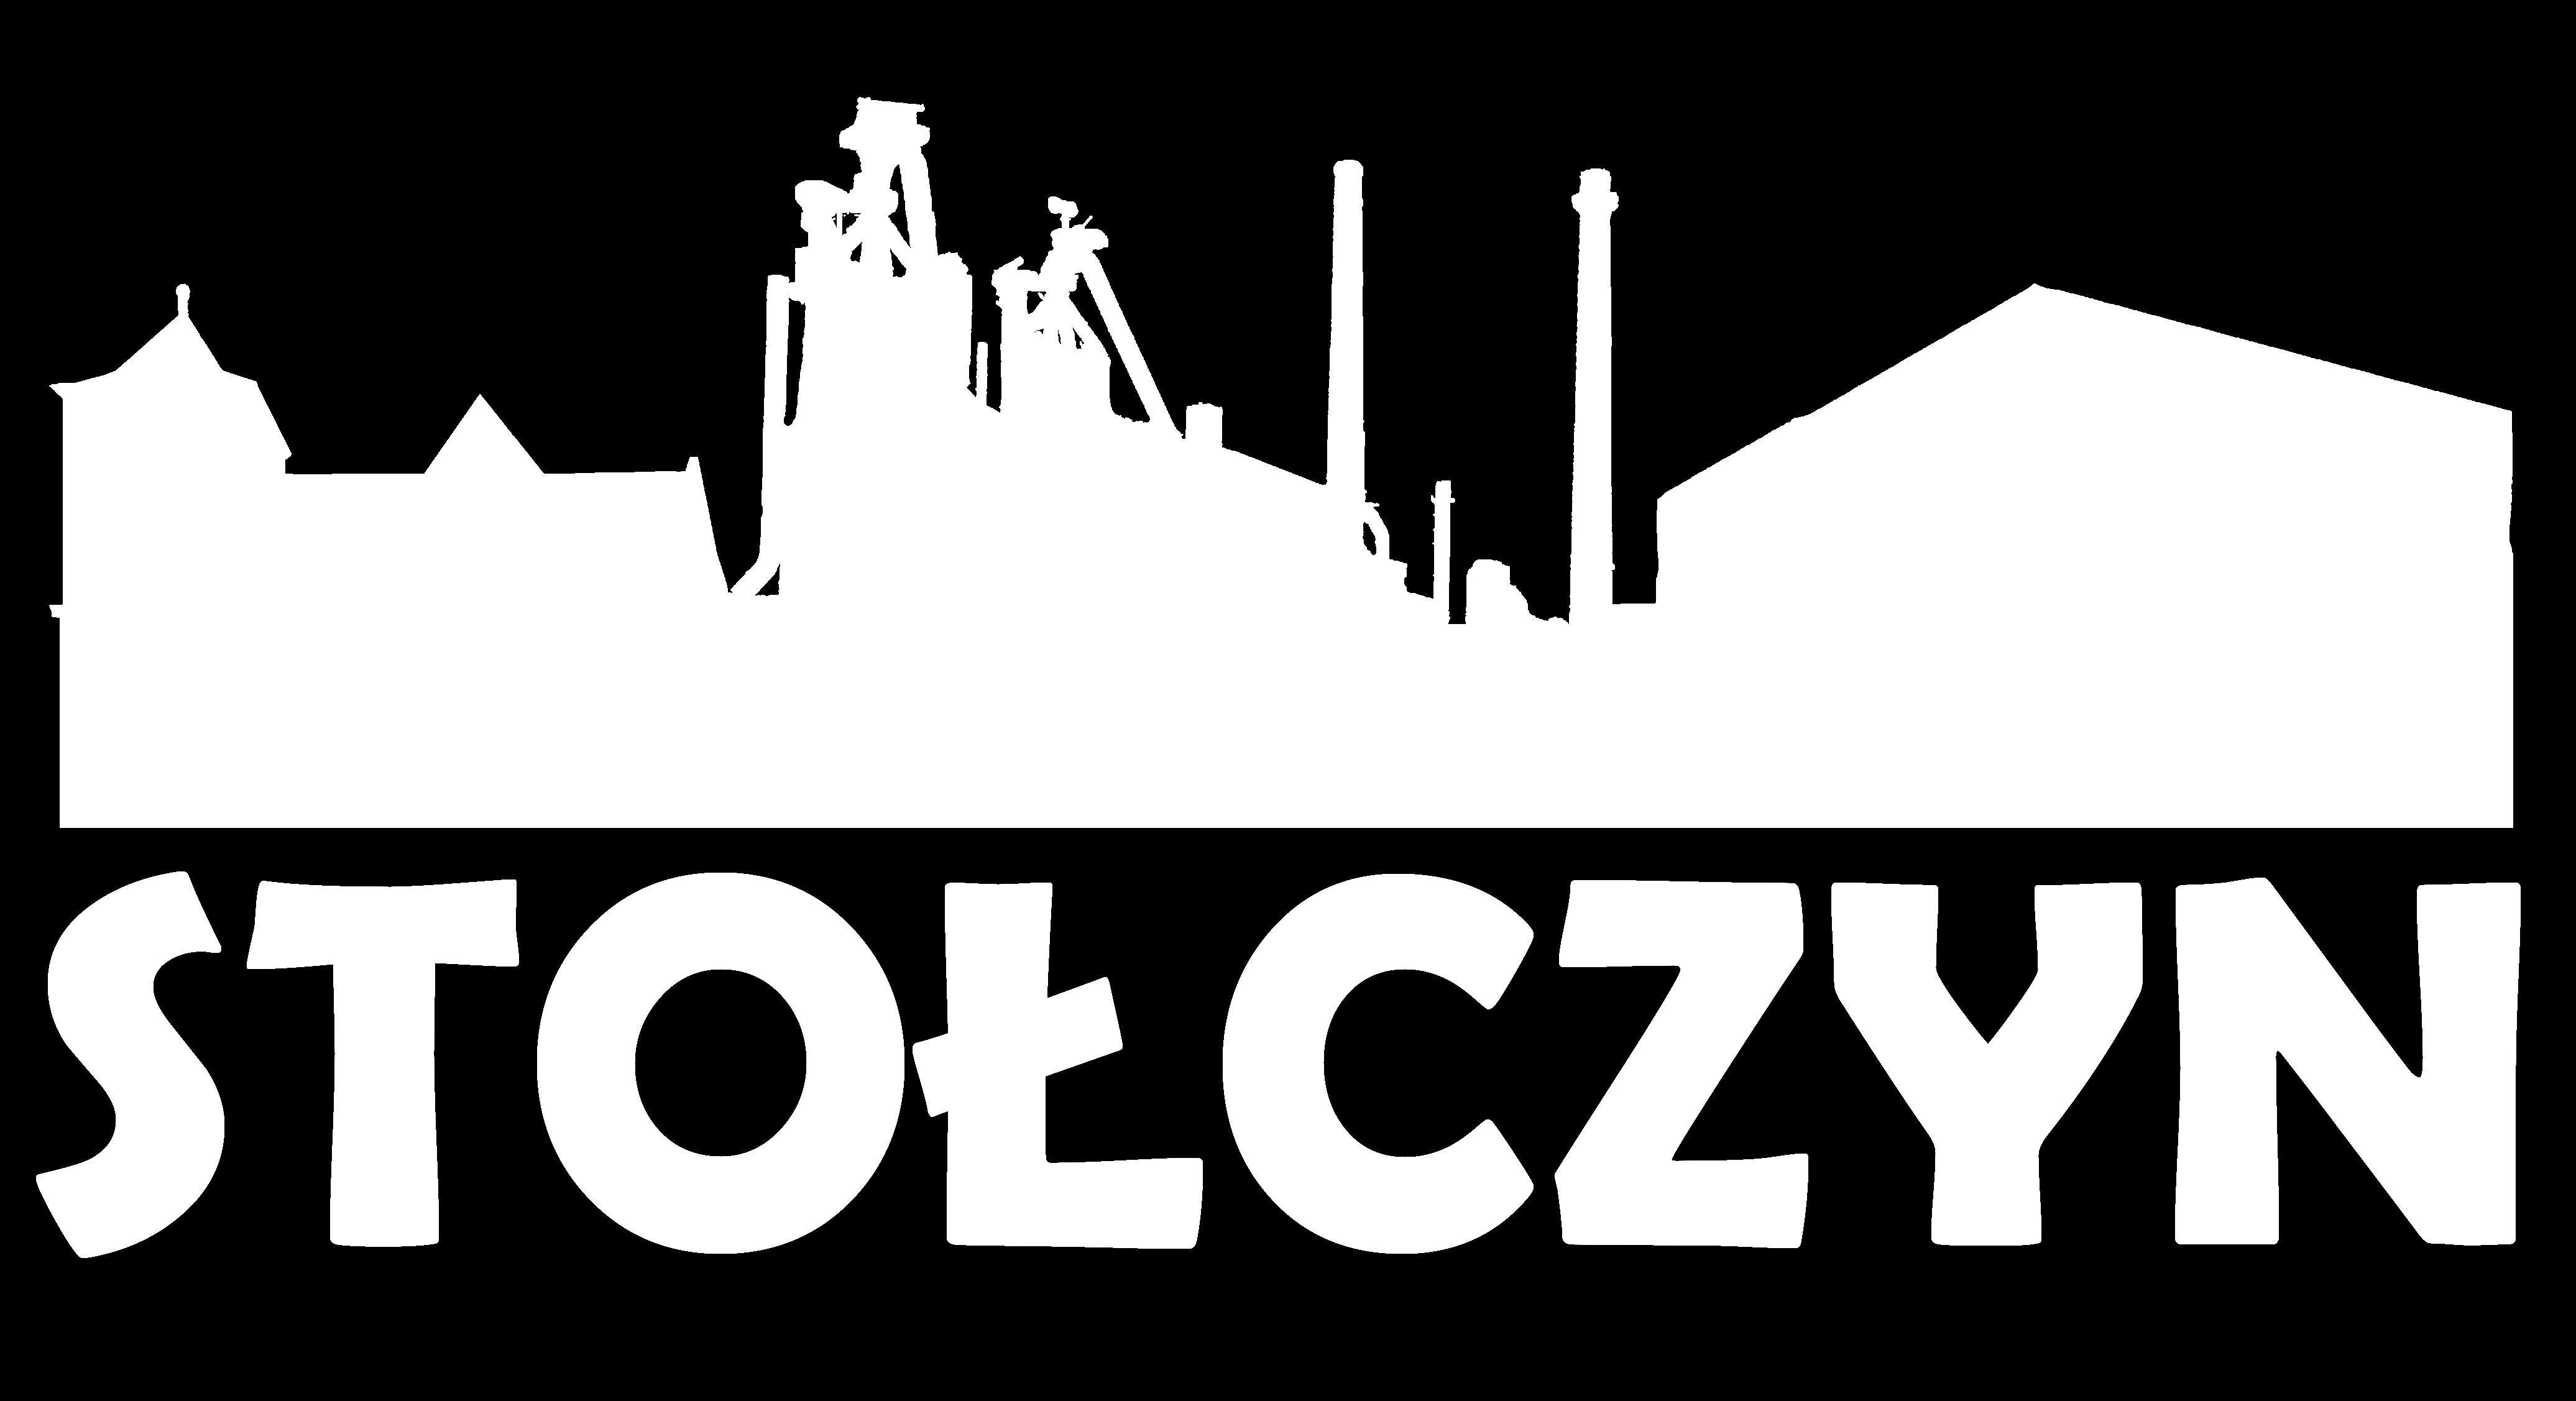 stolczyn. com logo